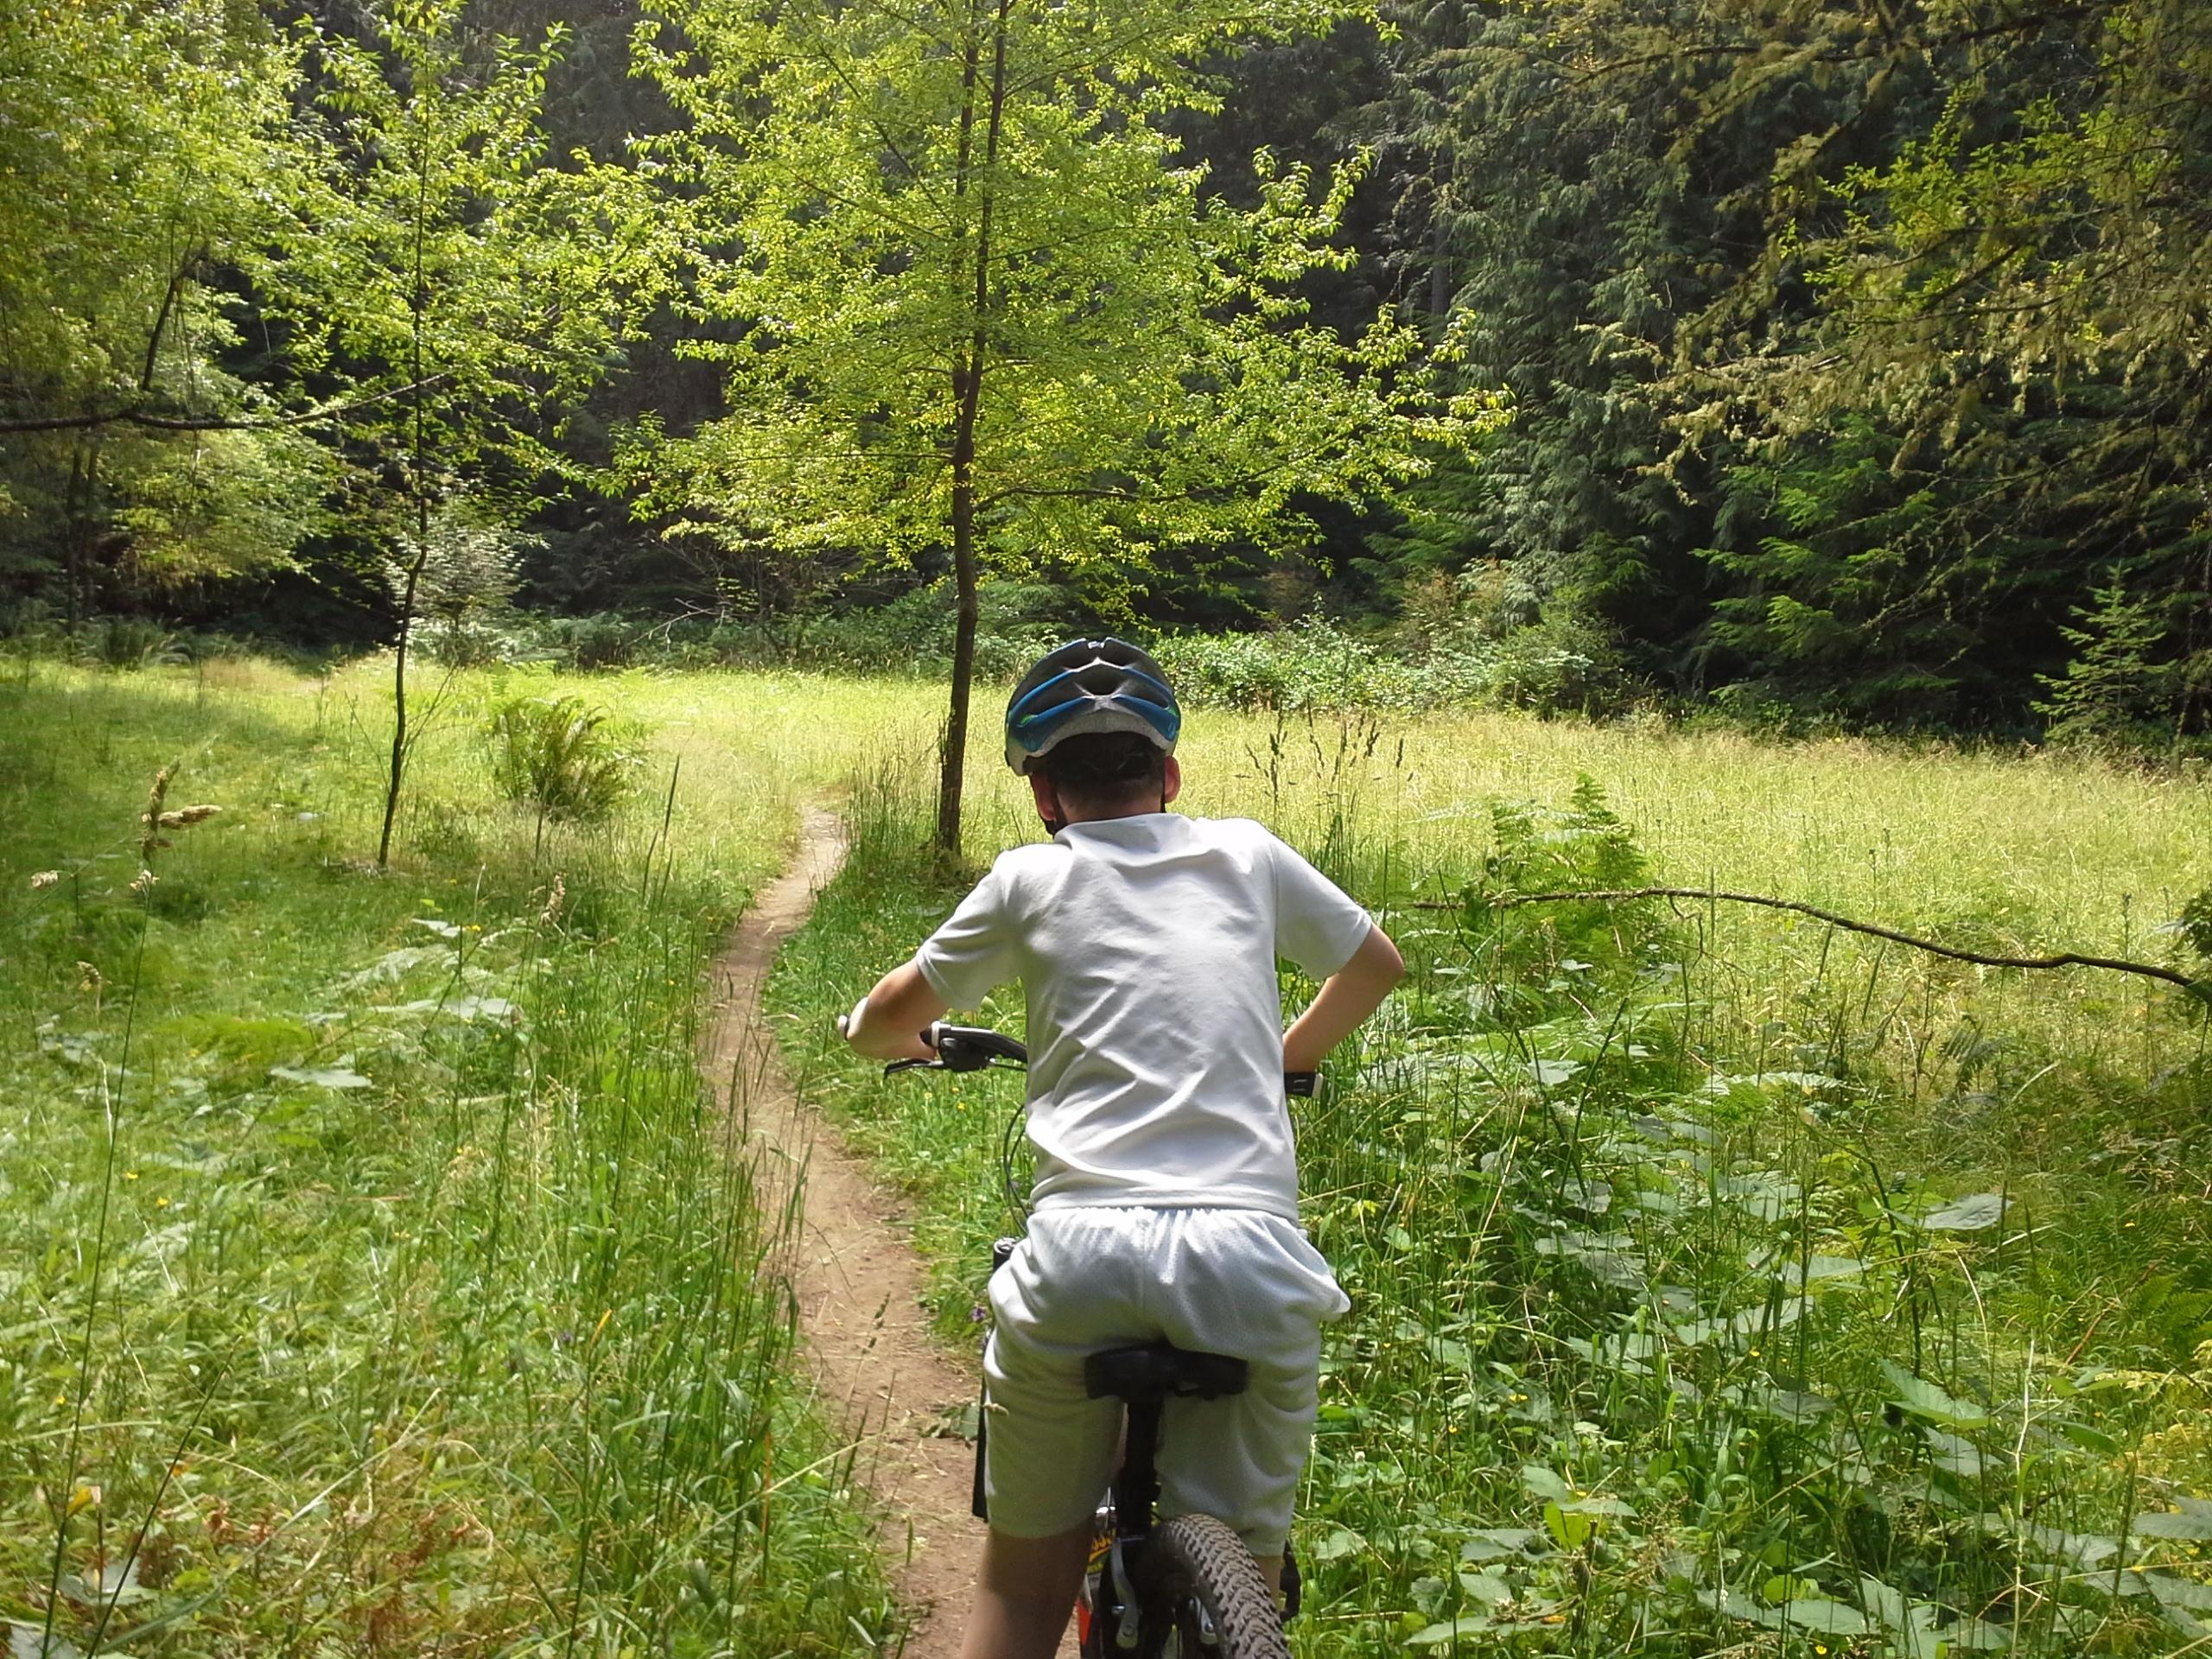 Mountain biking in Gazzam Preserve.